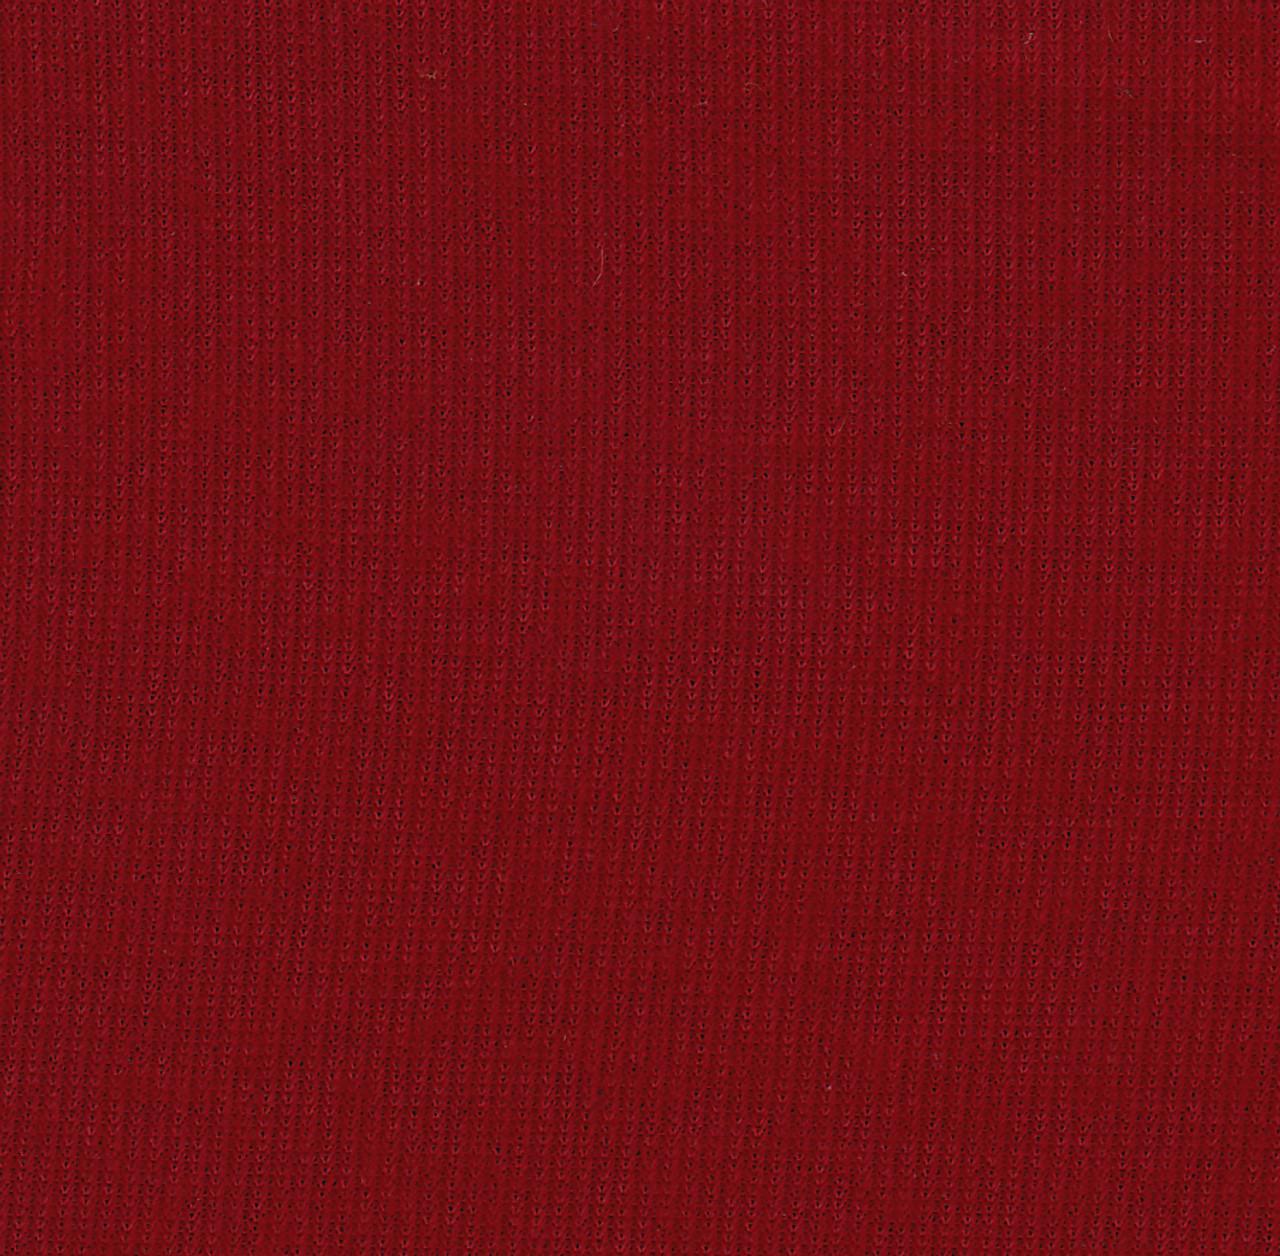 SunBrite SB-1872 Scarlet